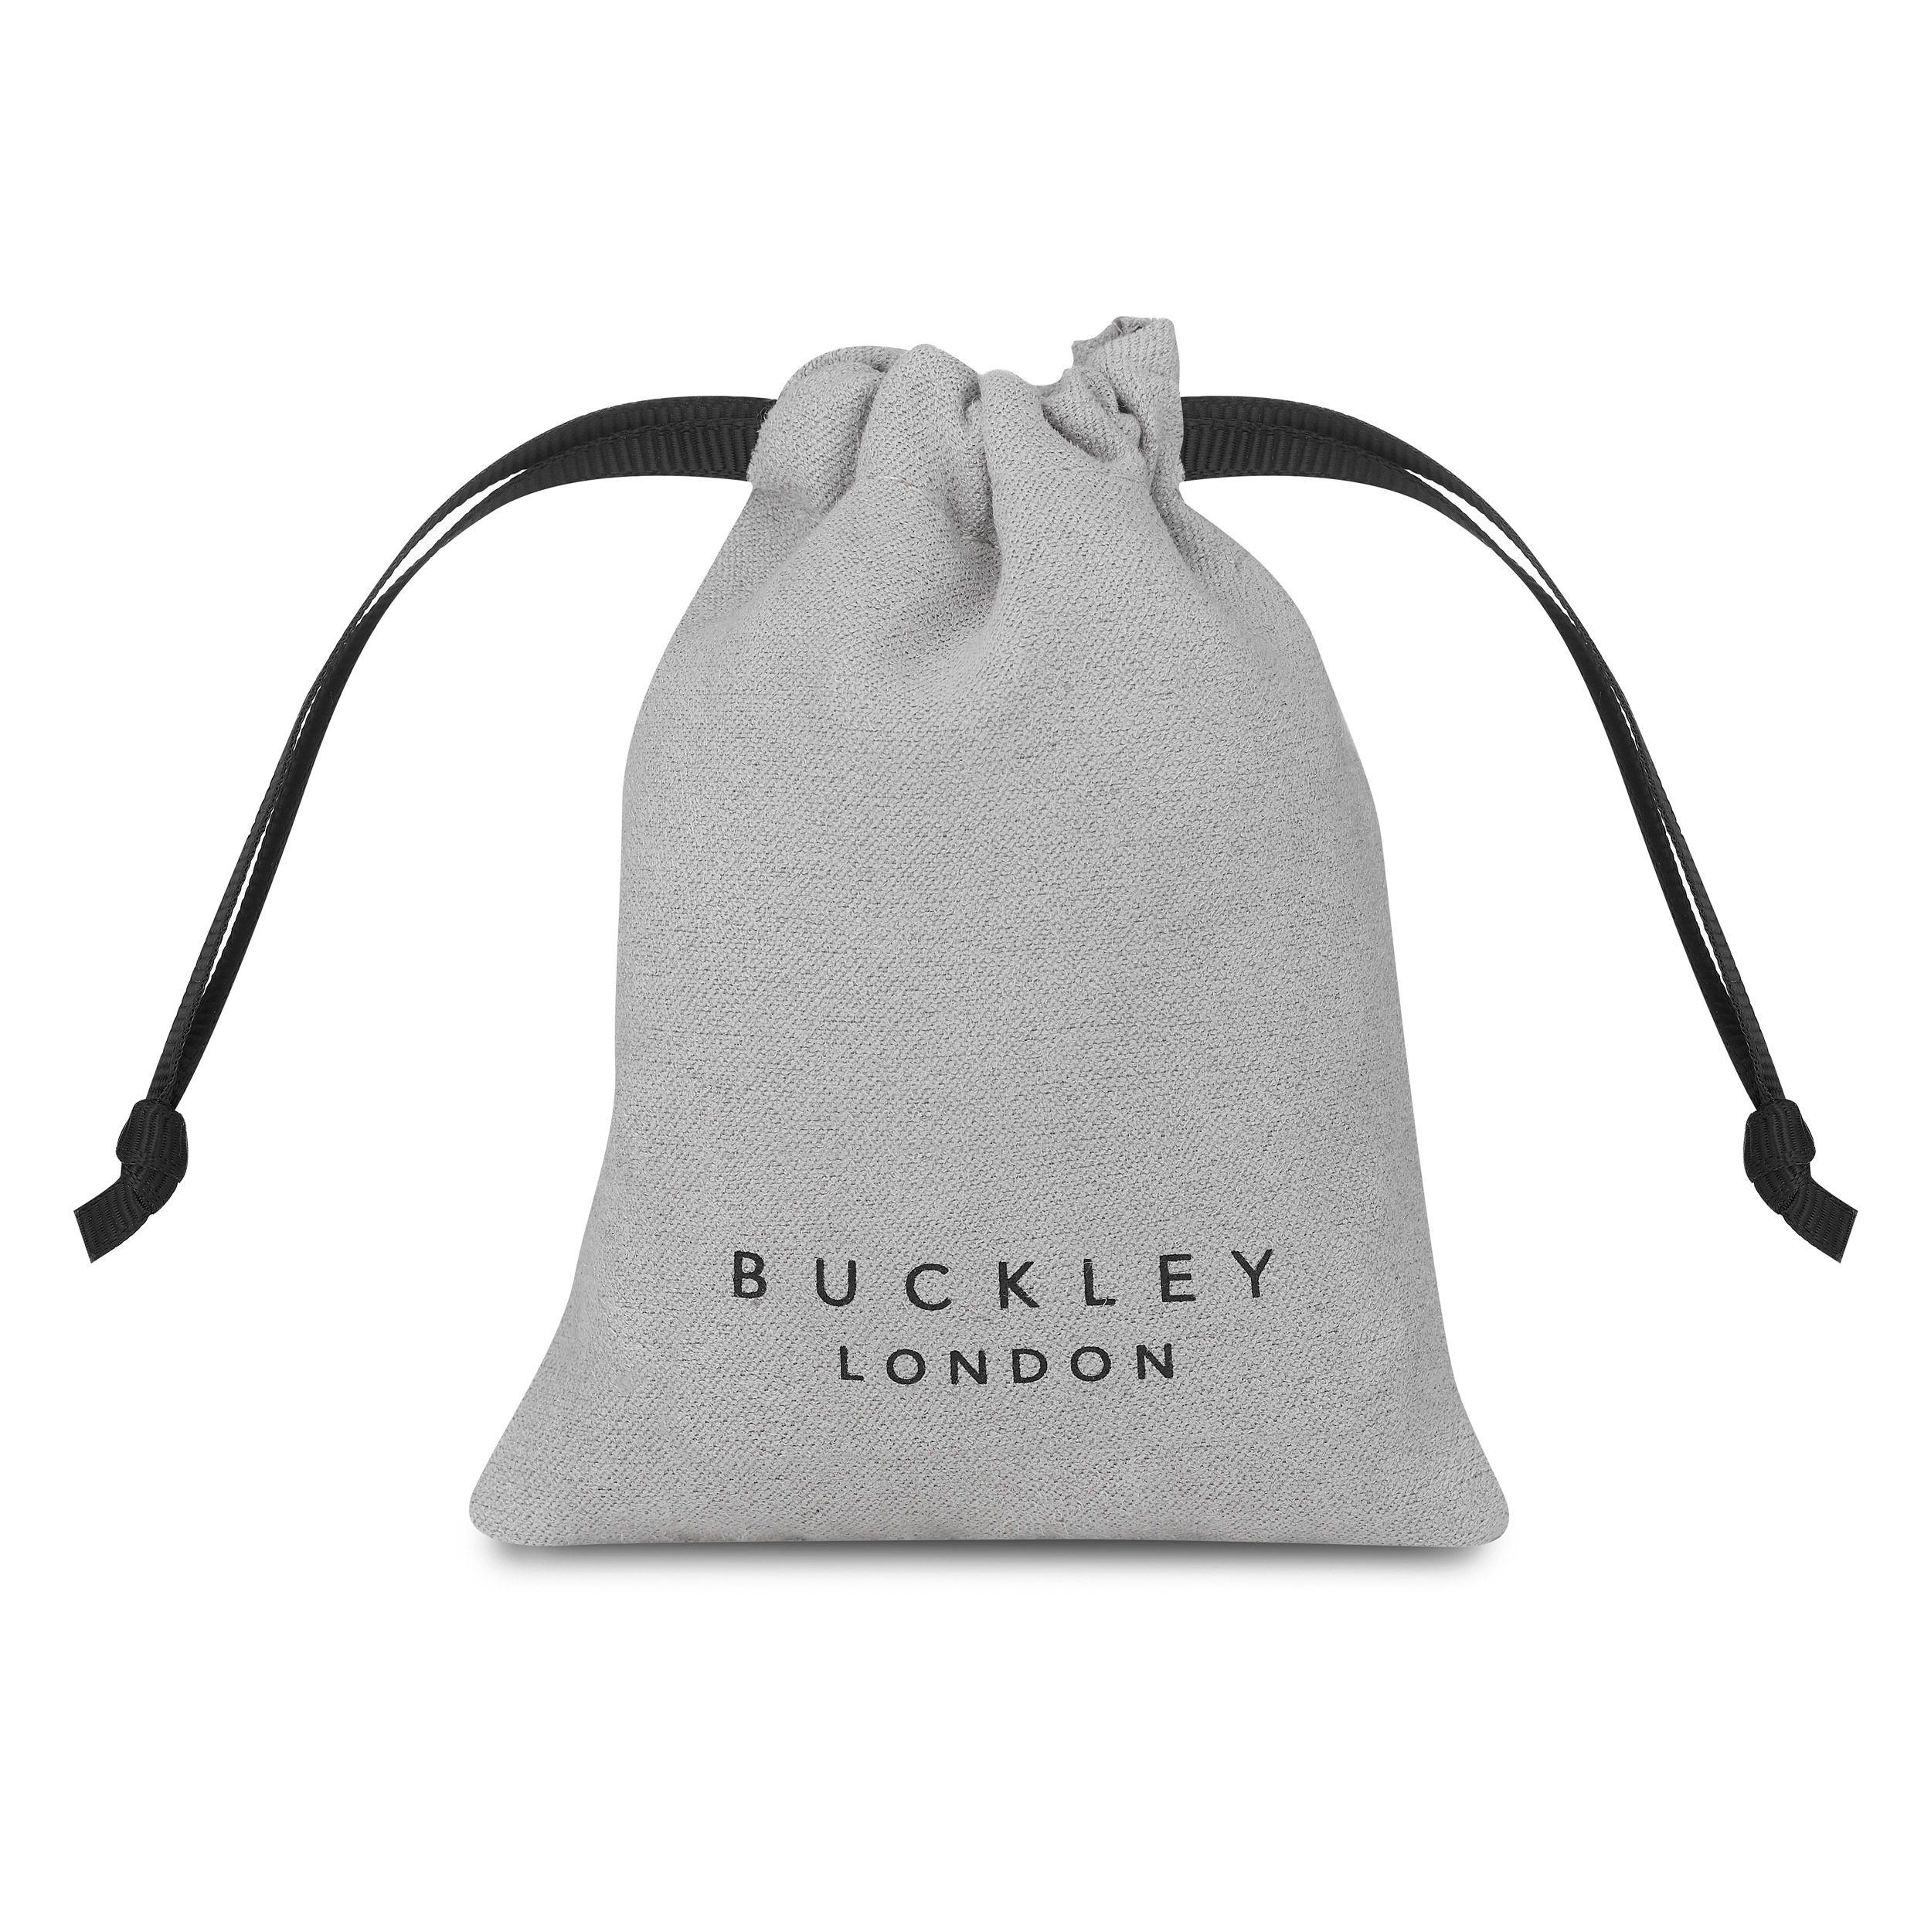 Buckley London Hugs & Kisses 'X' Bracelet - Rose Gold Bag